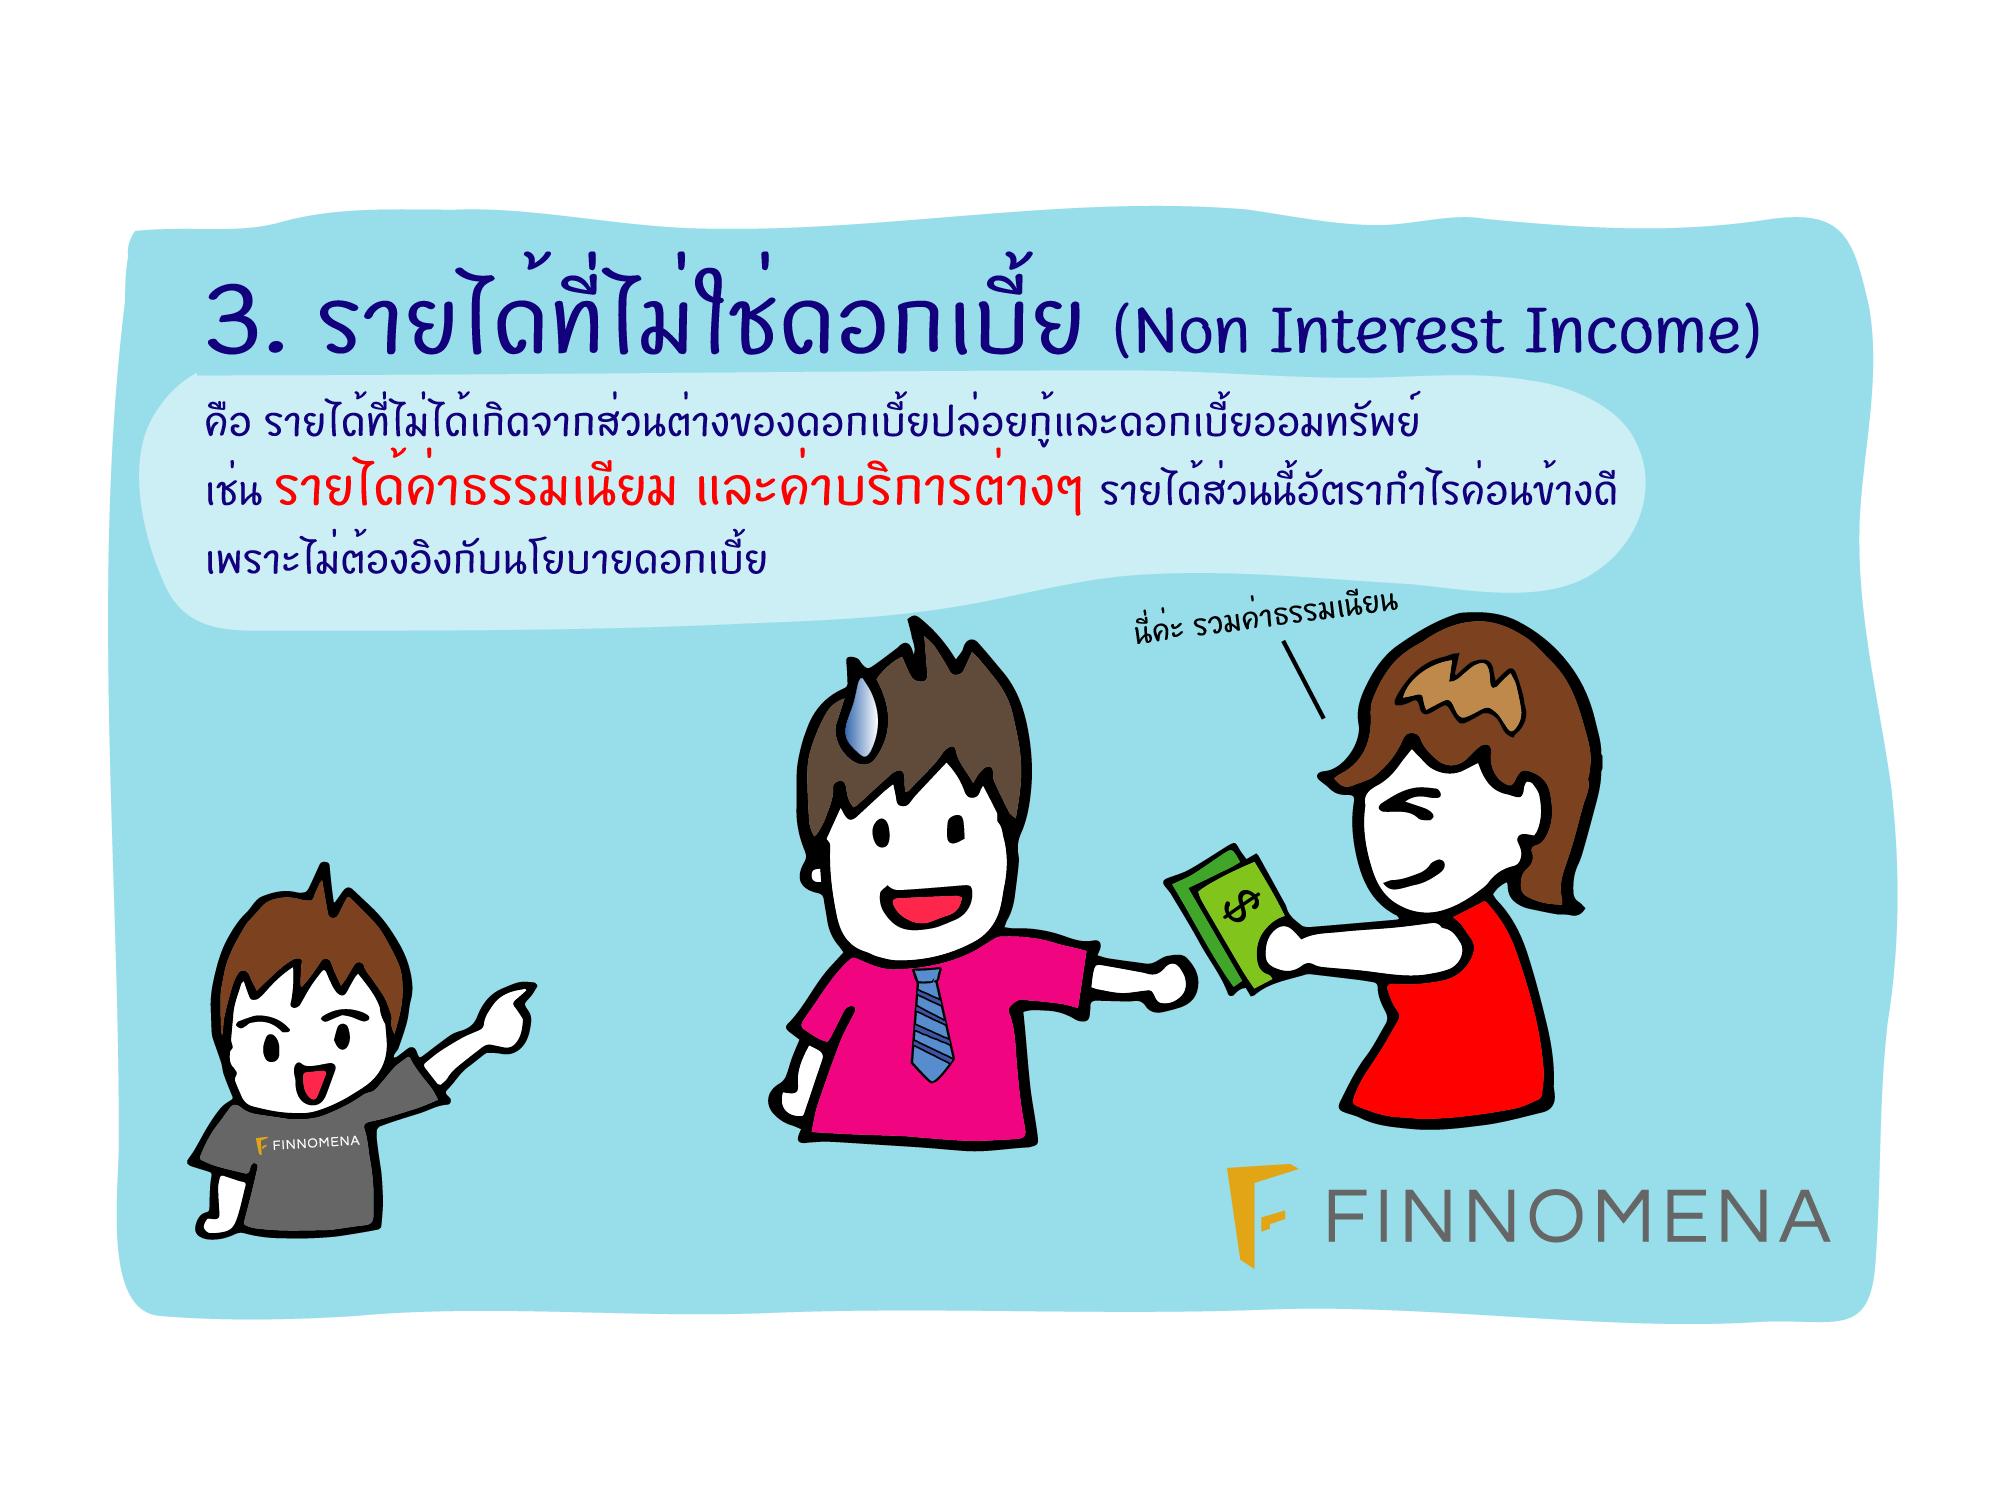 bank-statements_05